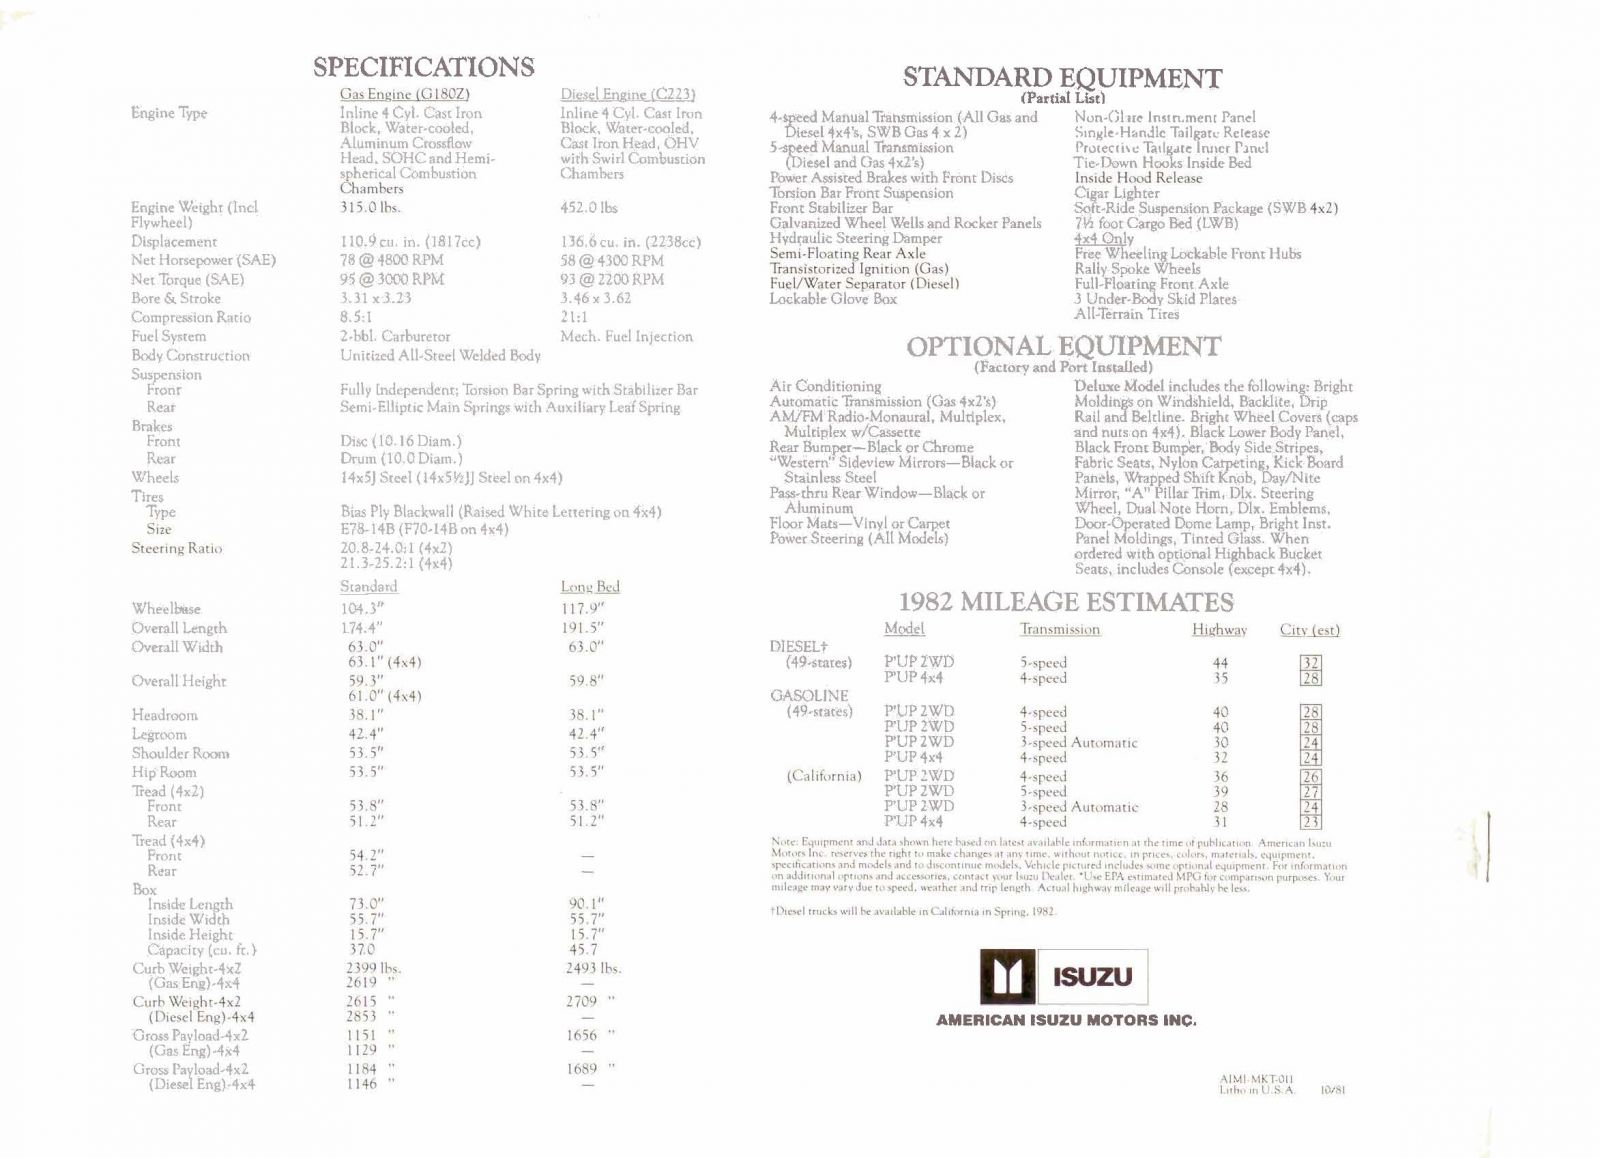 1982 Isuzu Pickups Page 12.jpg